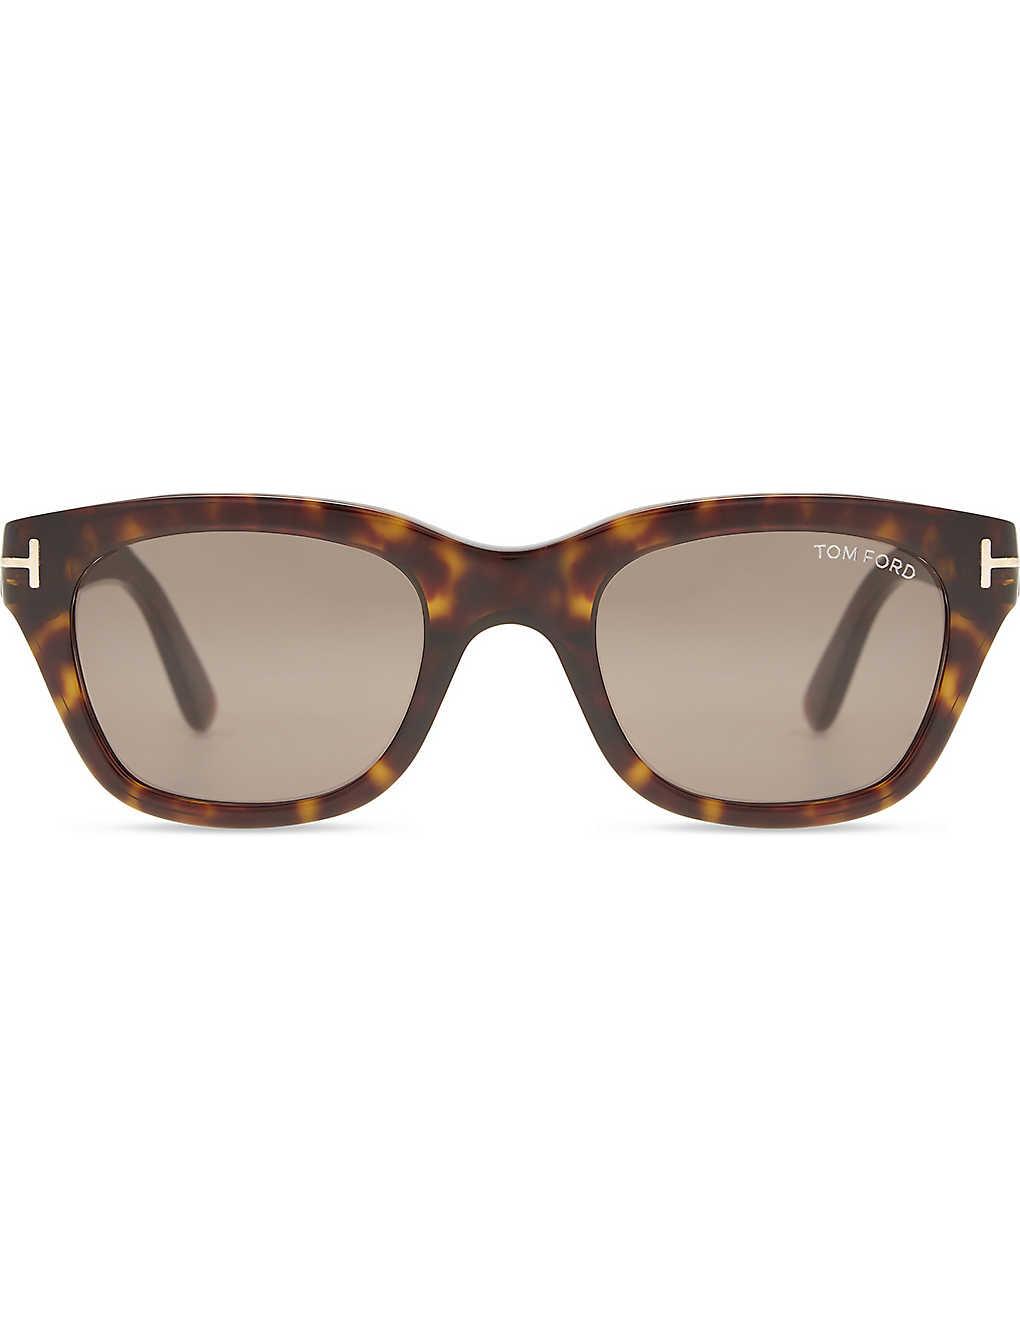 019c43ed7c TOM FORD - Snowdon tortoiseshell square-frame sunglasses ...